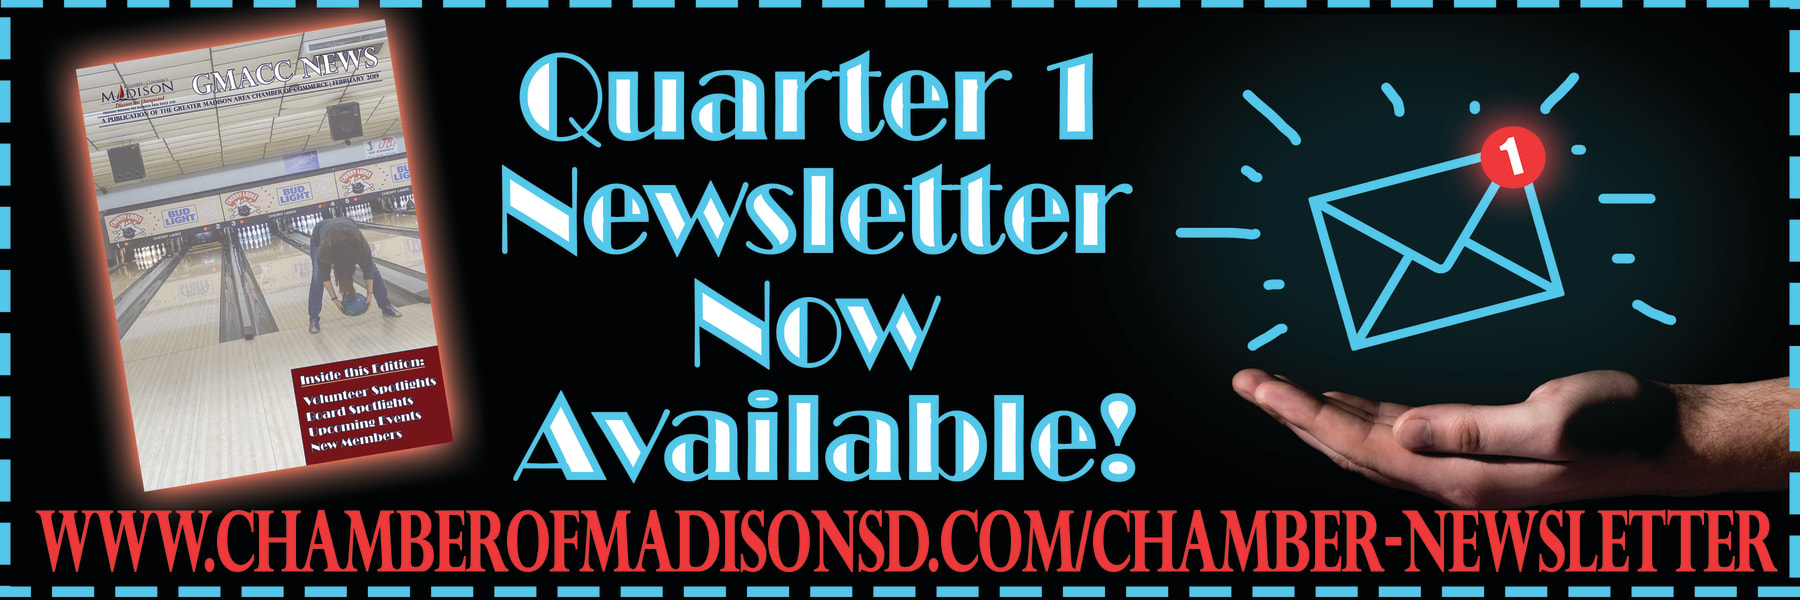 2019-Newsletter-Announcement-Quarter-1-w1800.jpg